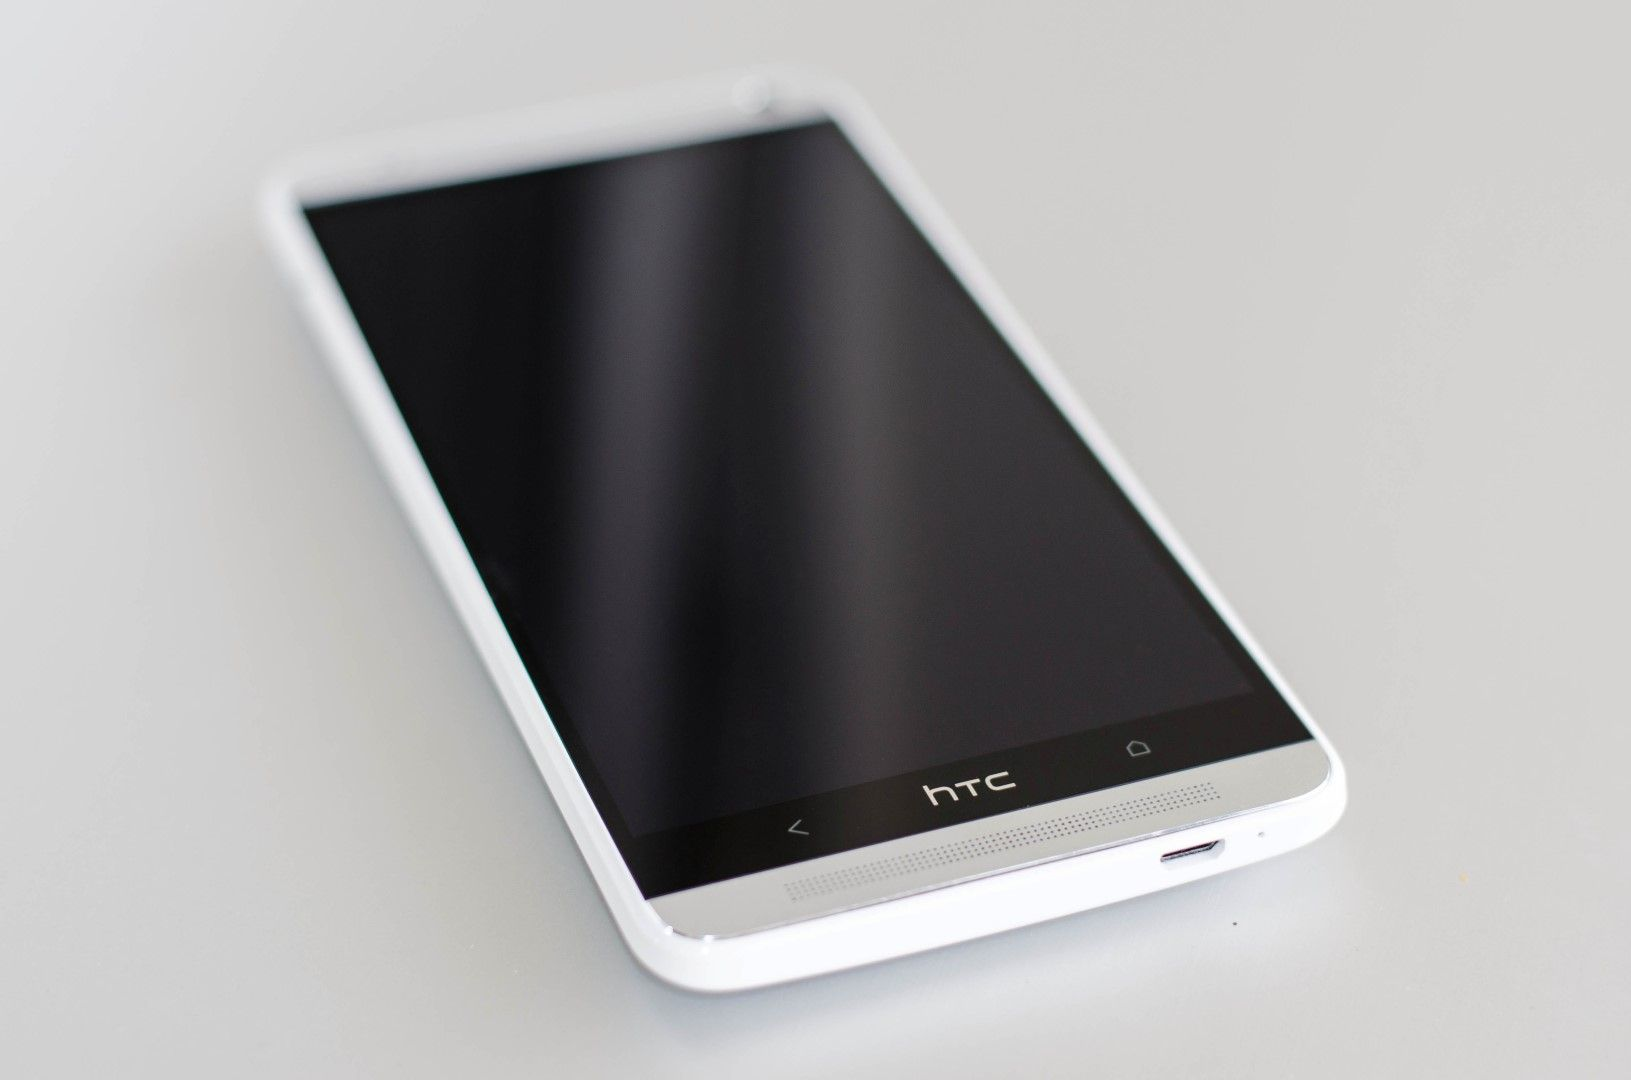 HTC One Max Alltagstest